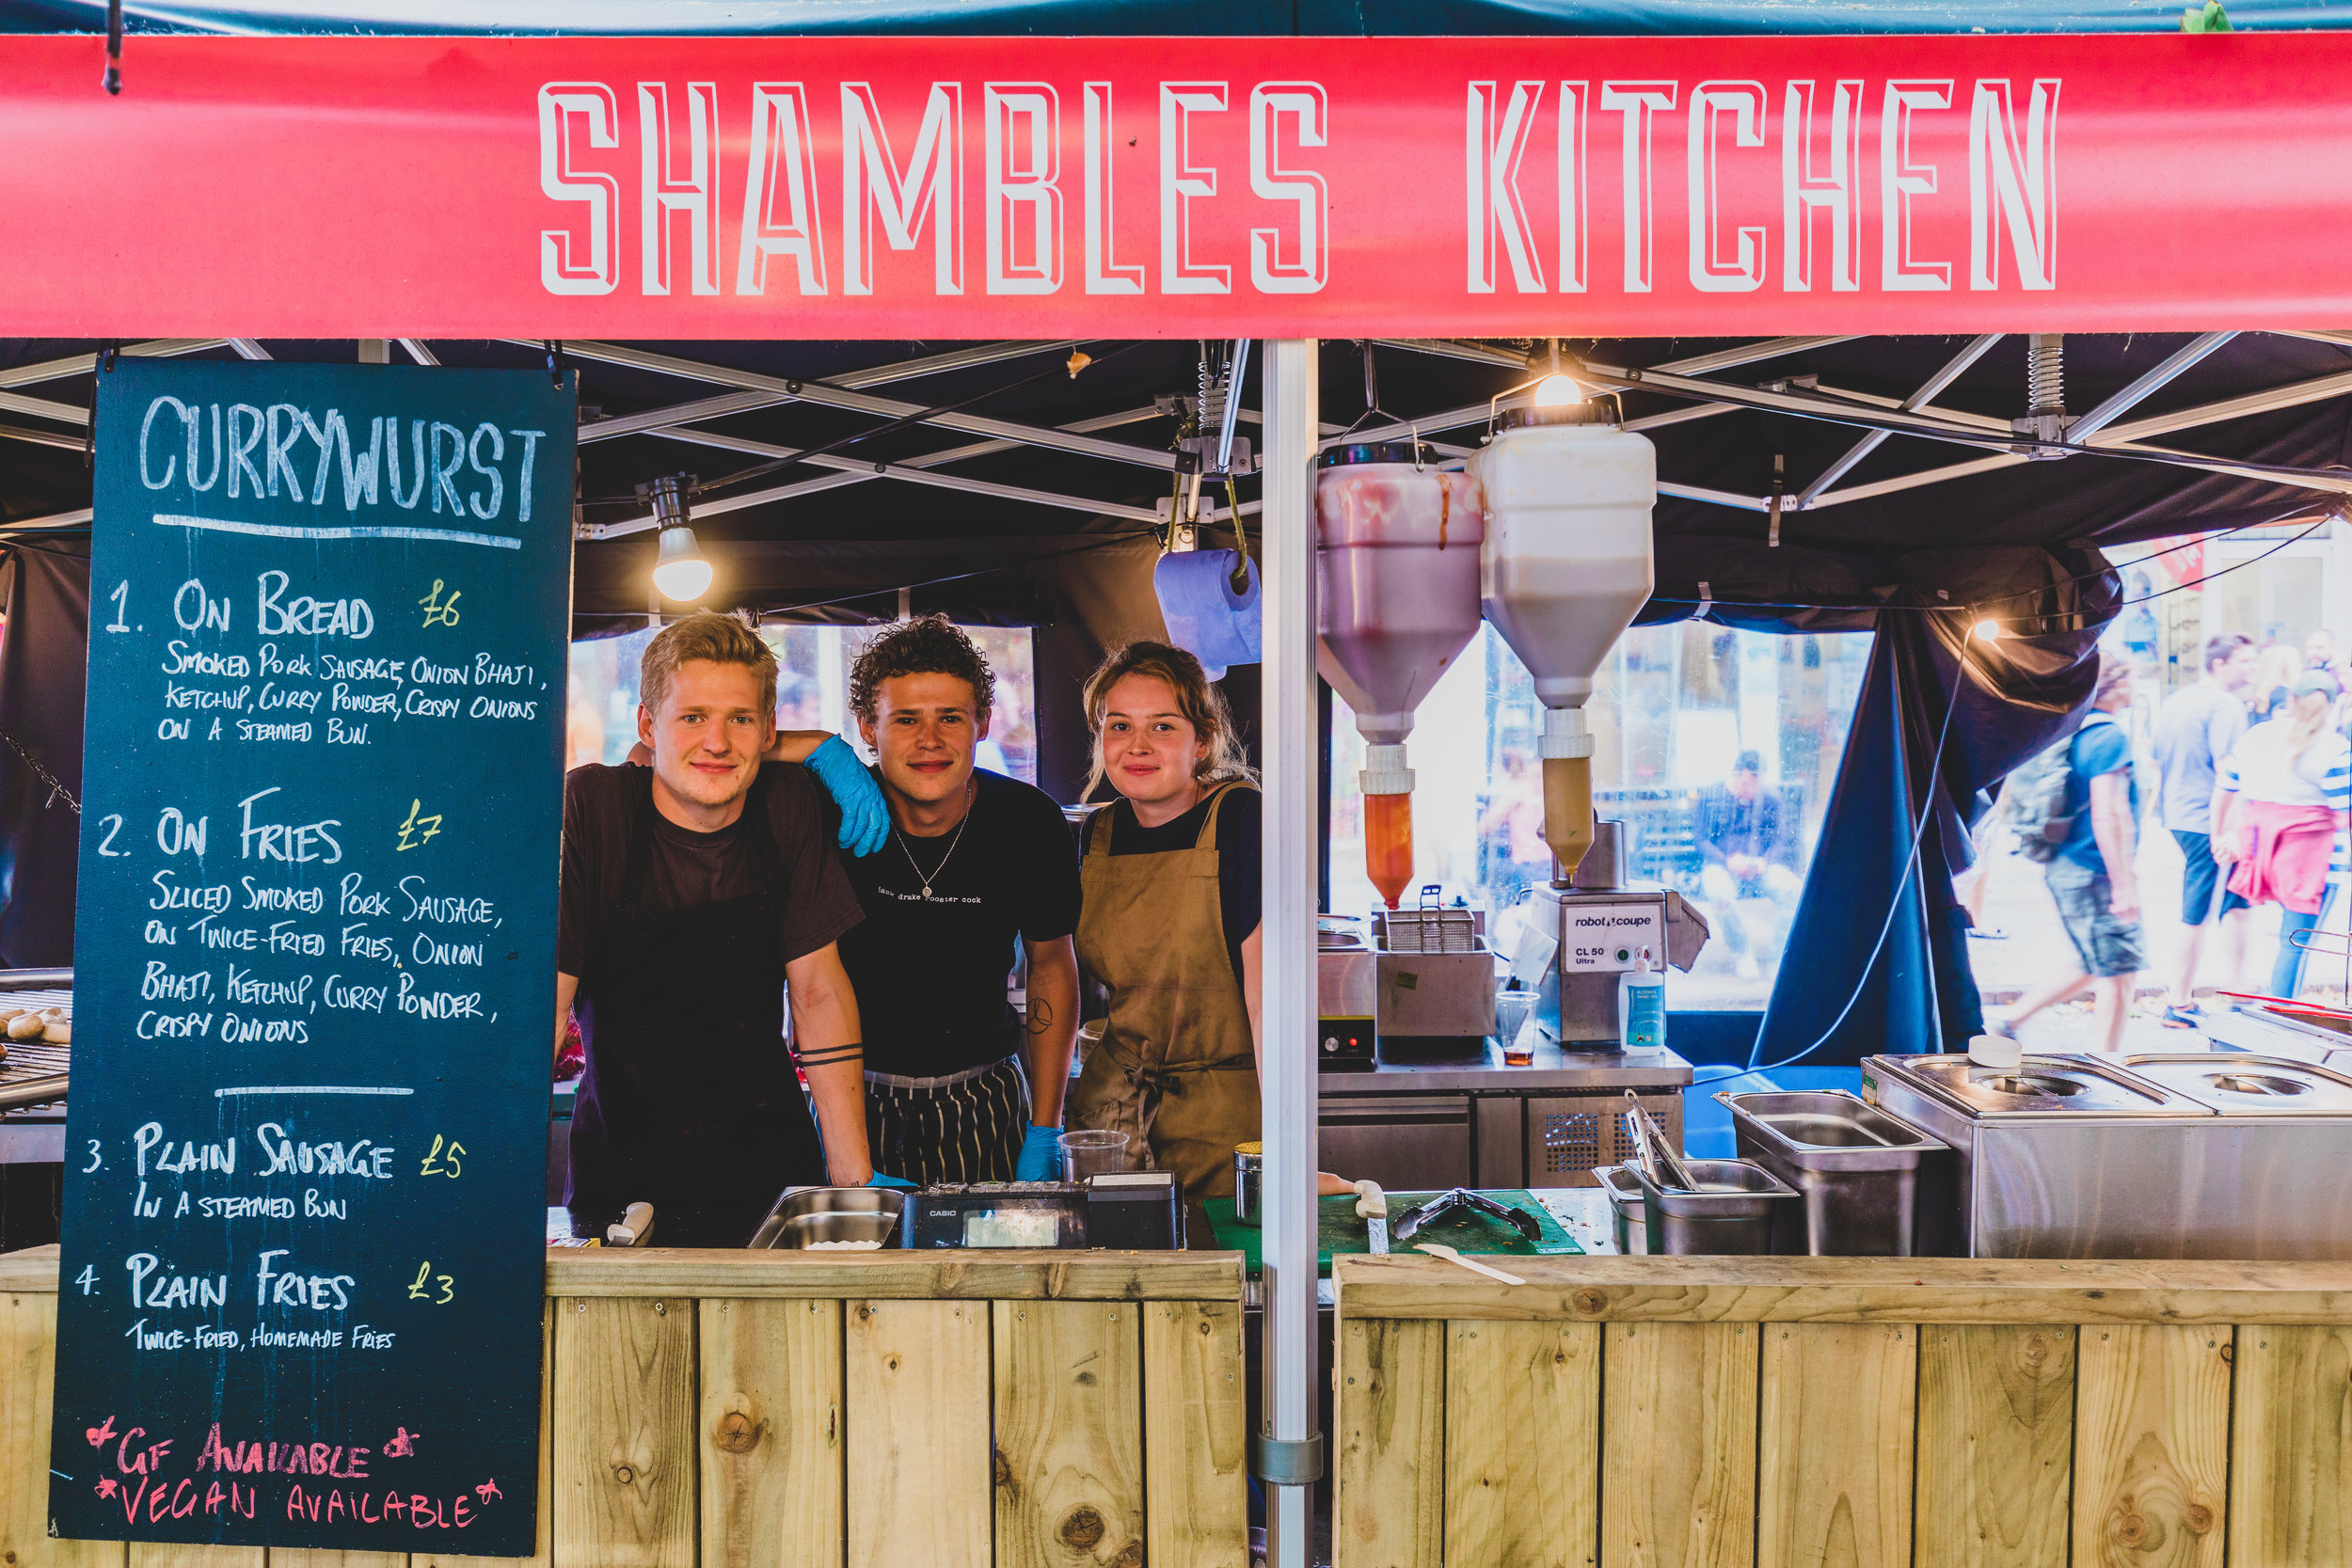 001 Shambles Kitchen Photos 2018_1.jpg